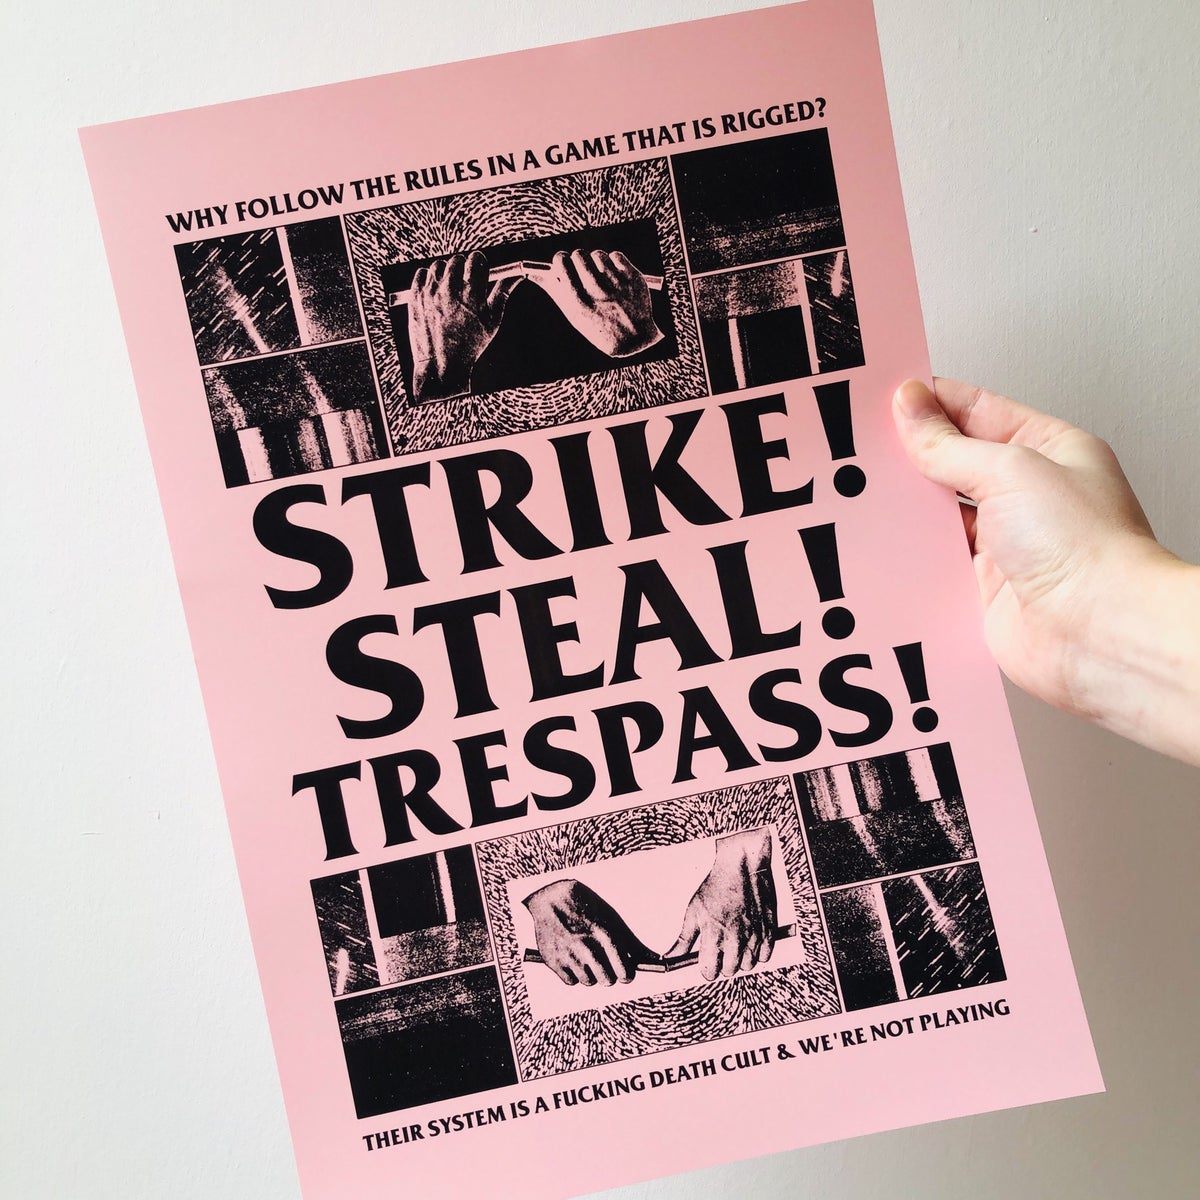 Image of Strike! Steal! Trespass! pink digital A3 print